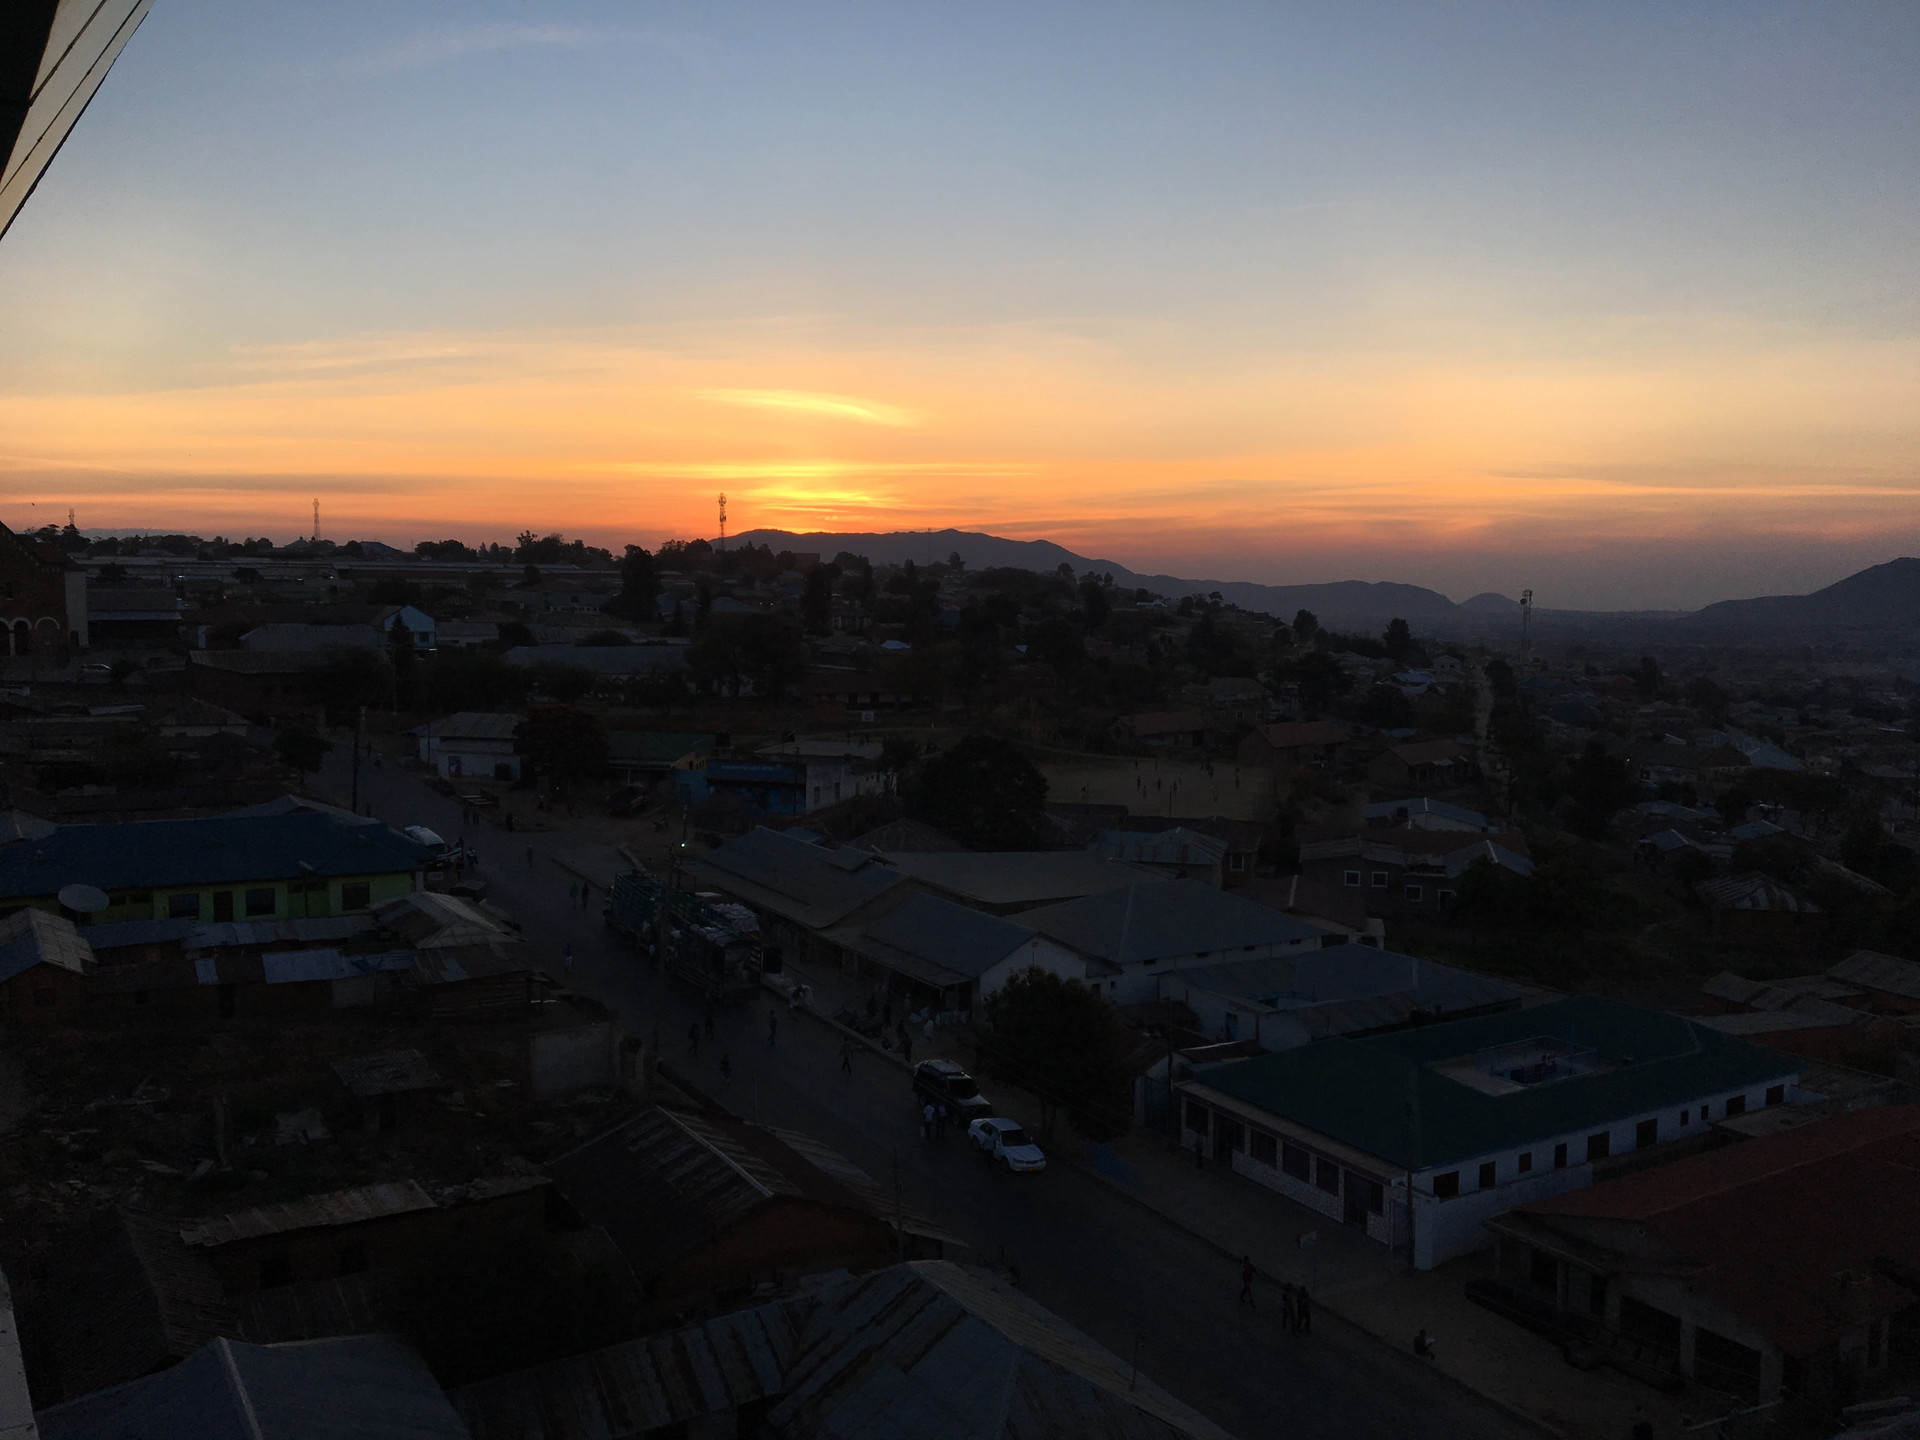 Sunset over Iringa